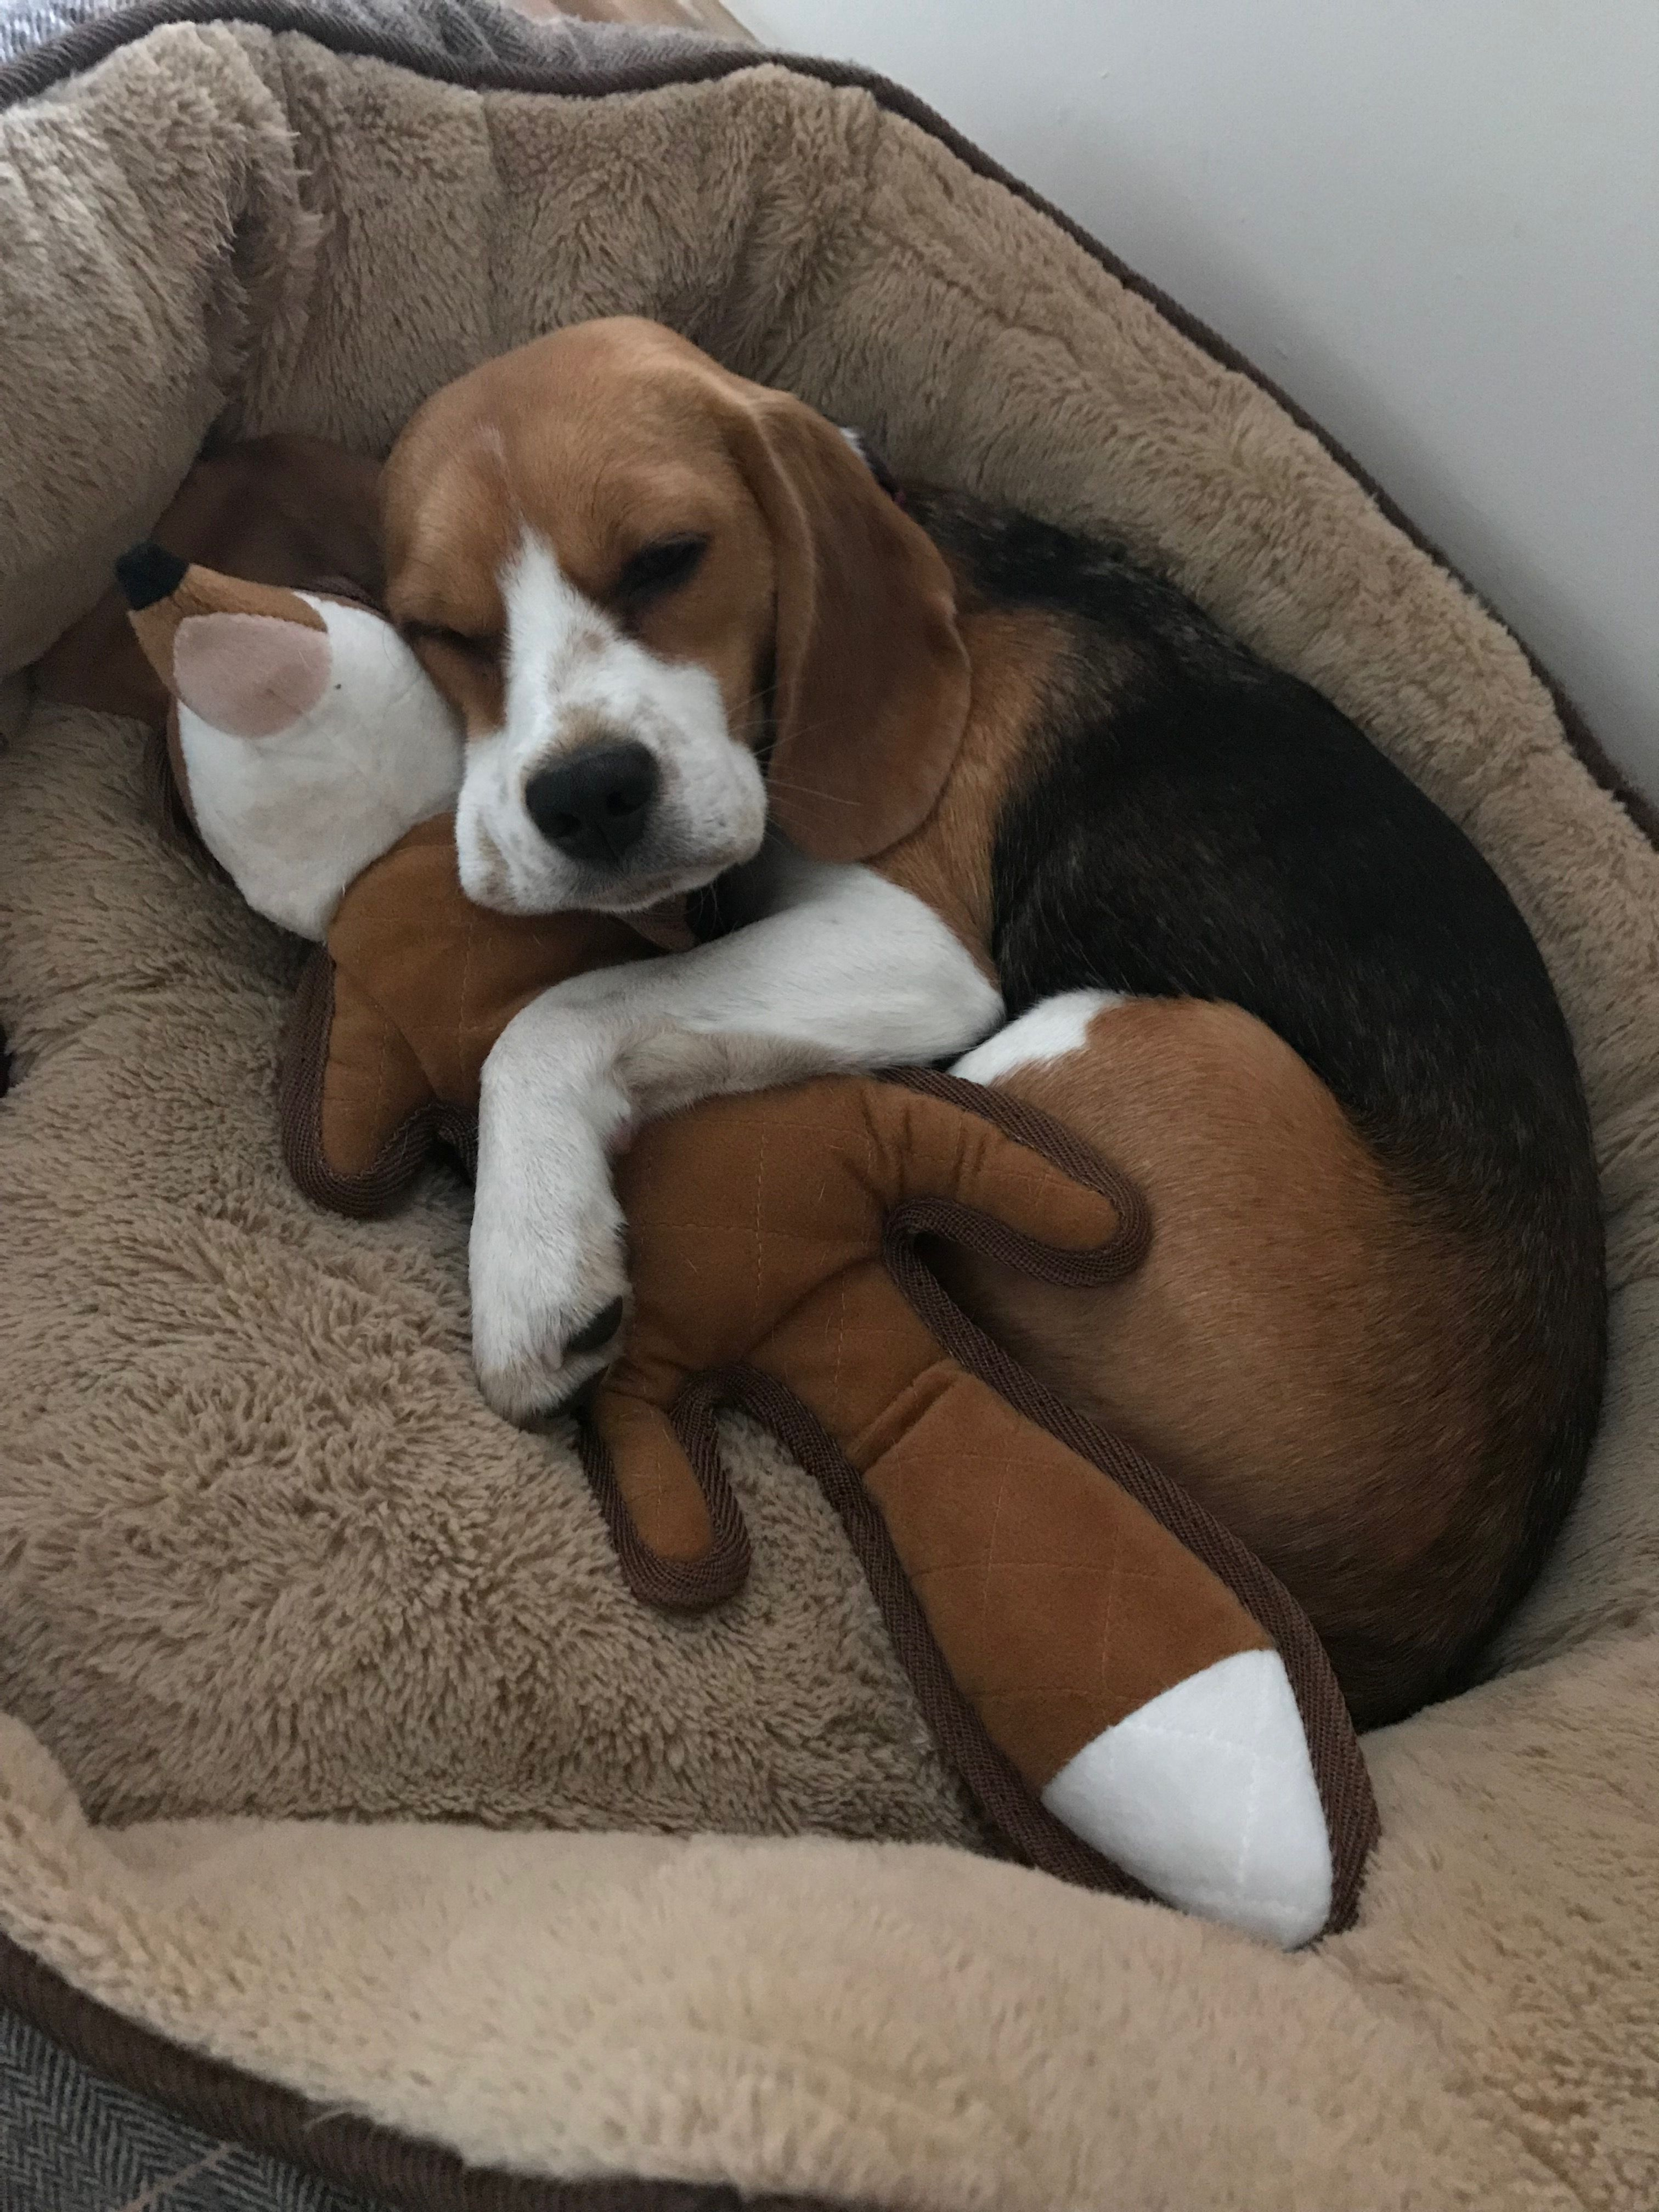 A Real Good Sleep With My Friend Beagle Puppy Beagle Dog